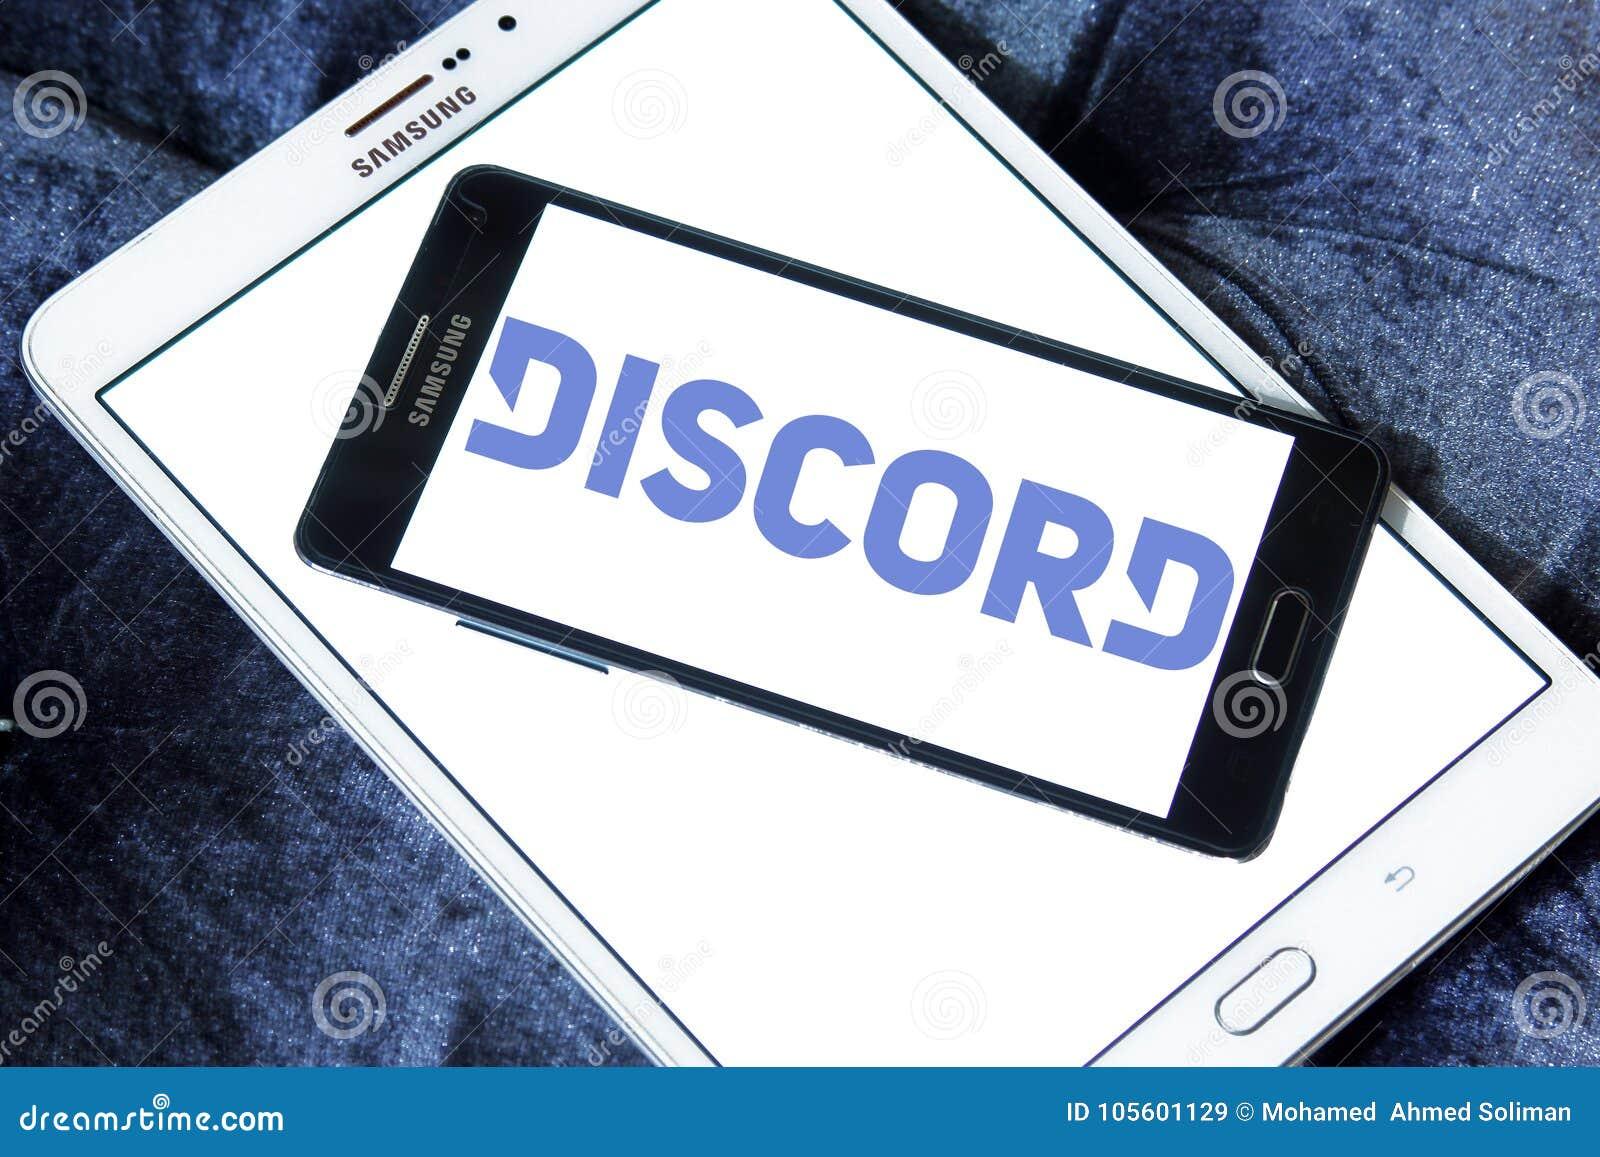 Discord Software Logo Editorial Stock Image Image Of Freeware 105601129